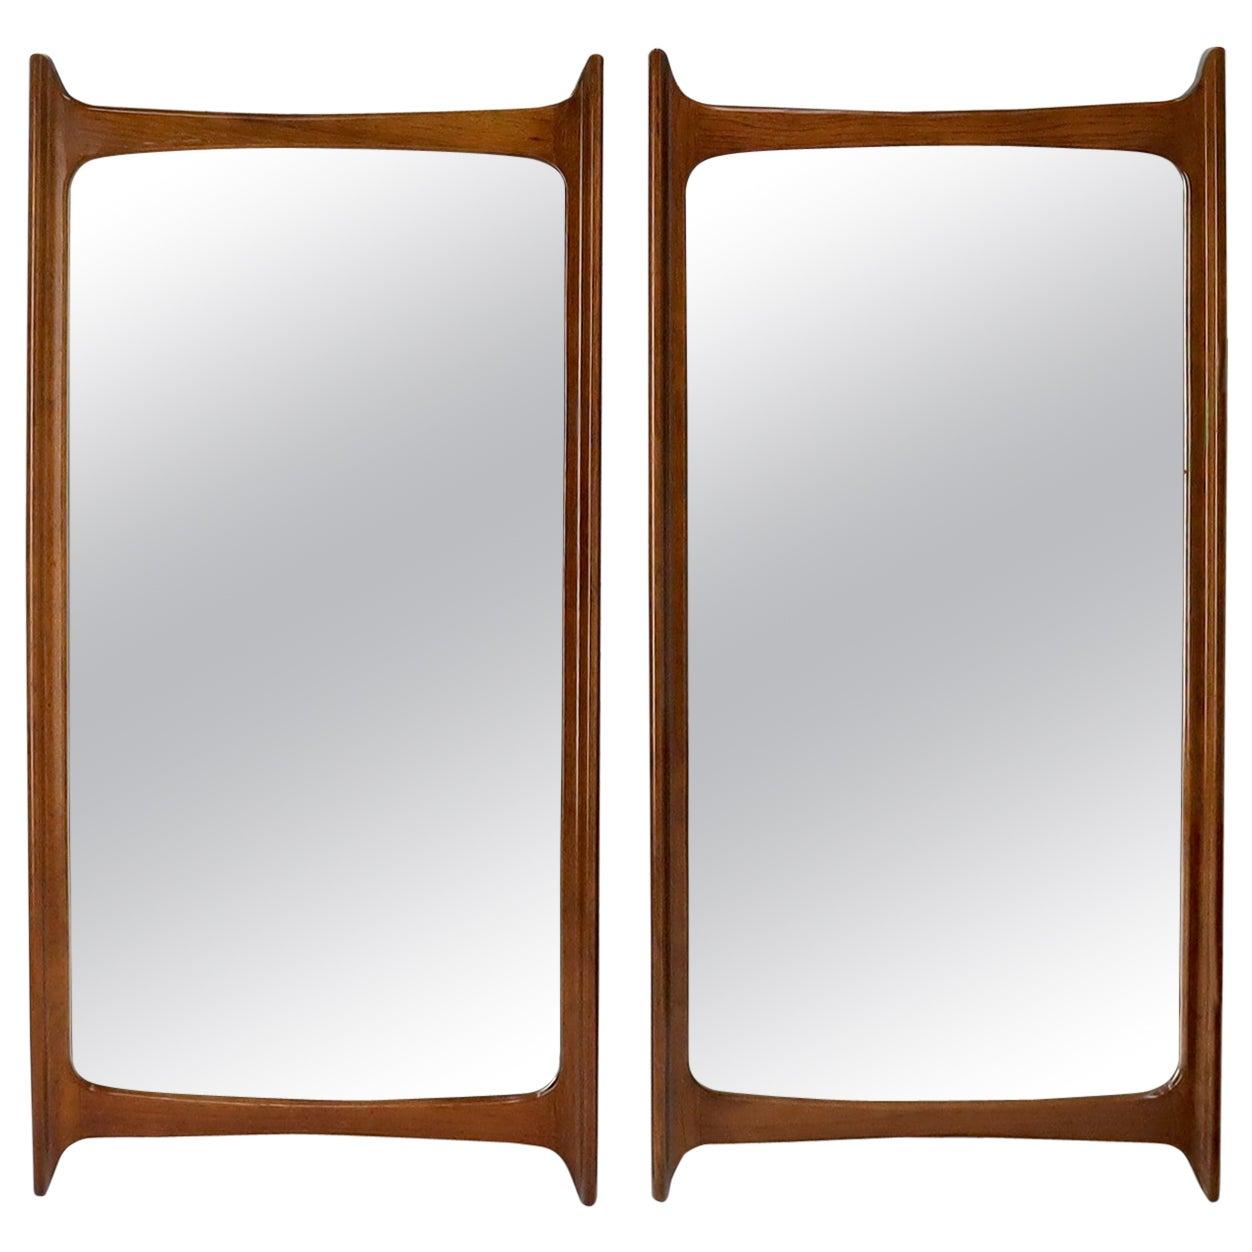 Pair of Large Mid-Century Modern Walnut Mirrors